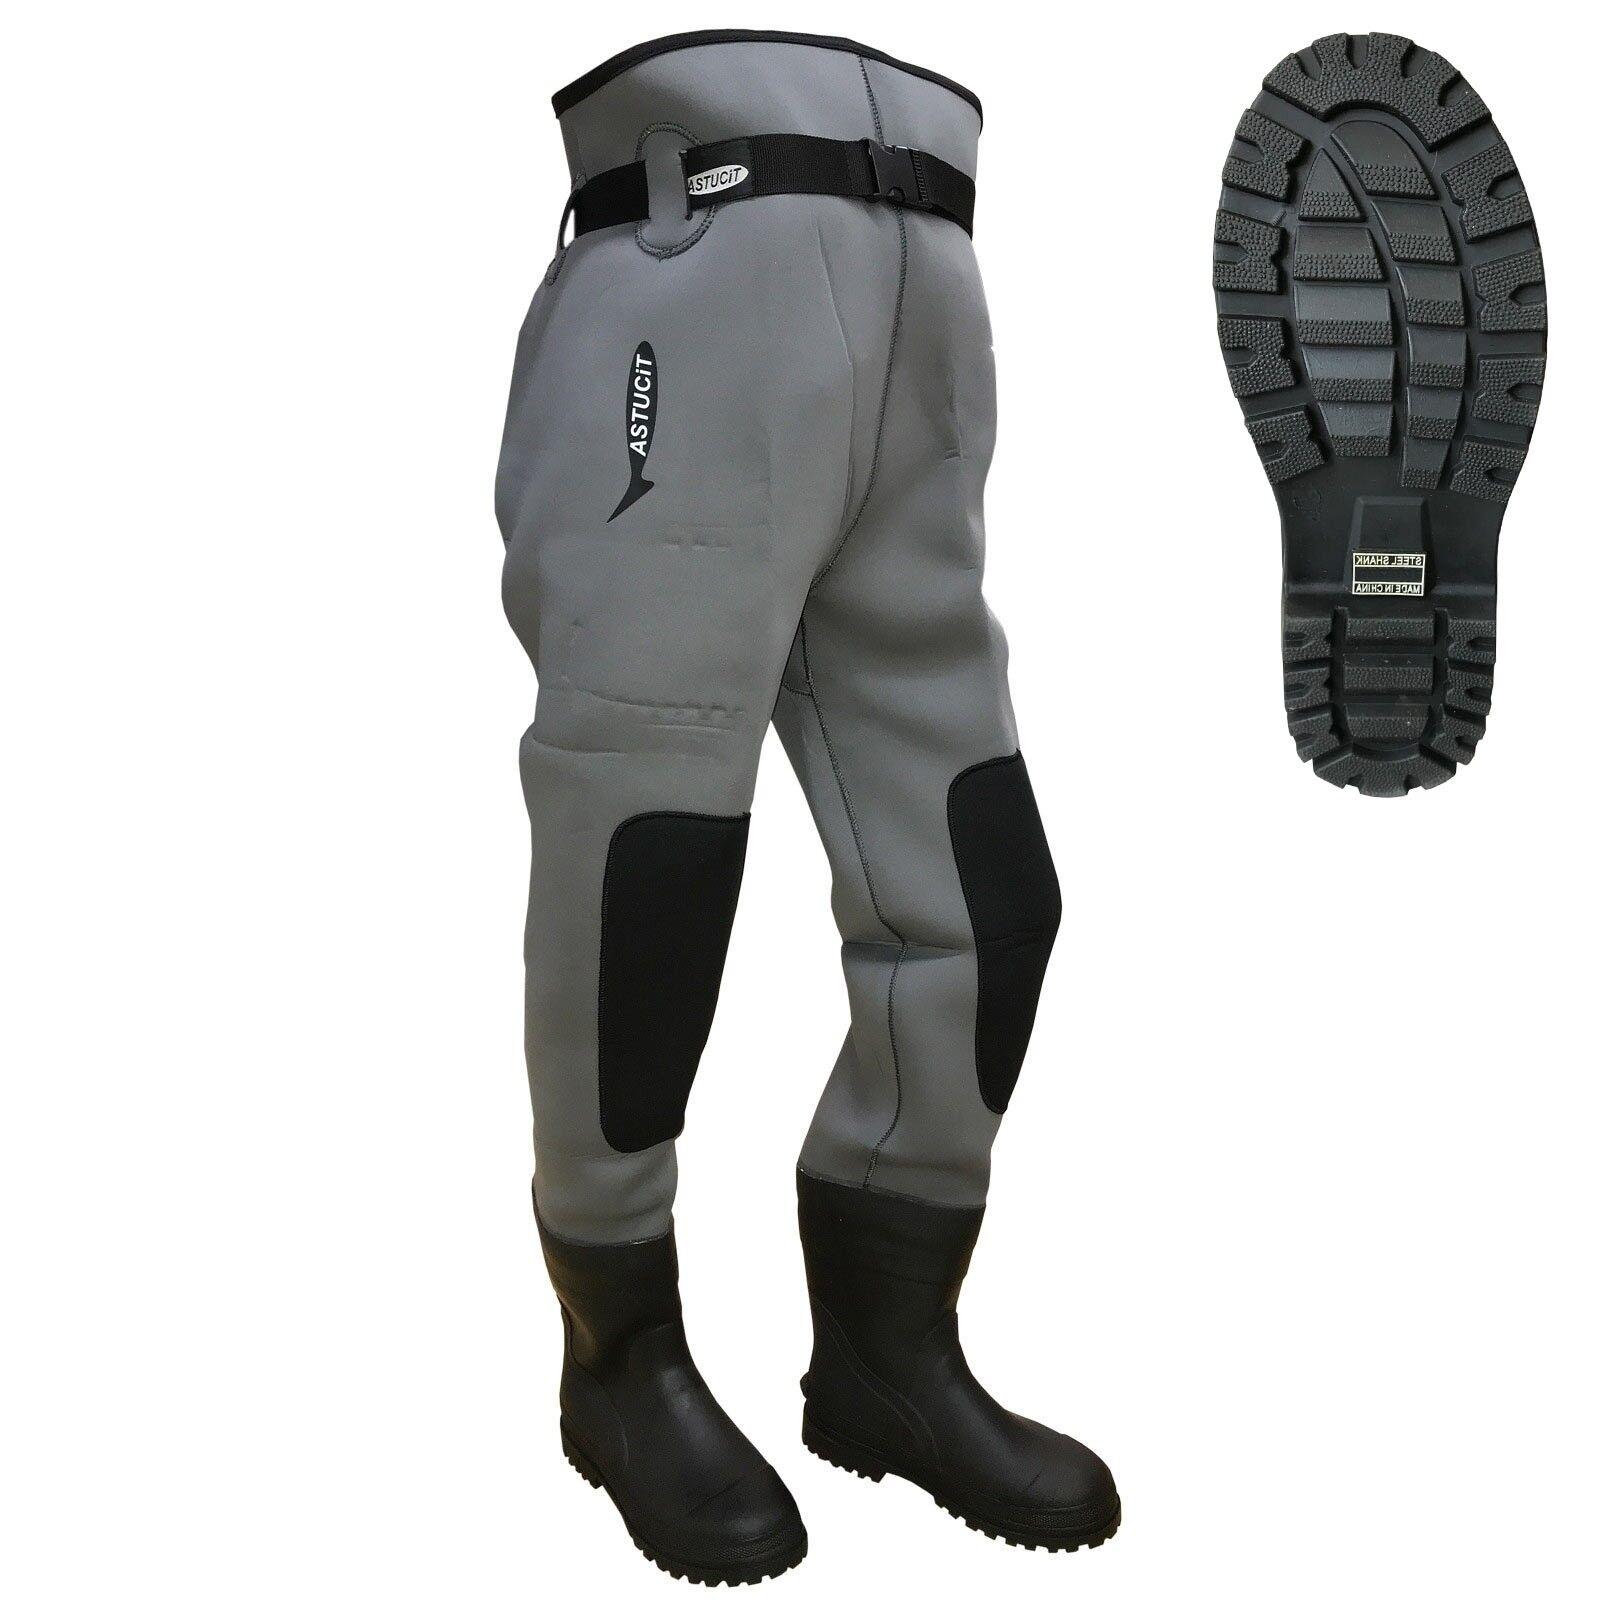 Aguaberg ASTUCIT pantalones - Deluxe neopreno 4 mm Talla  42 43  diseño único